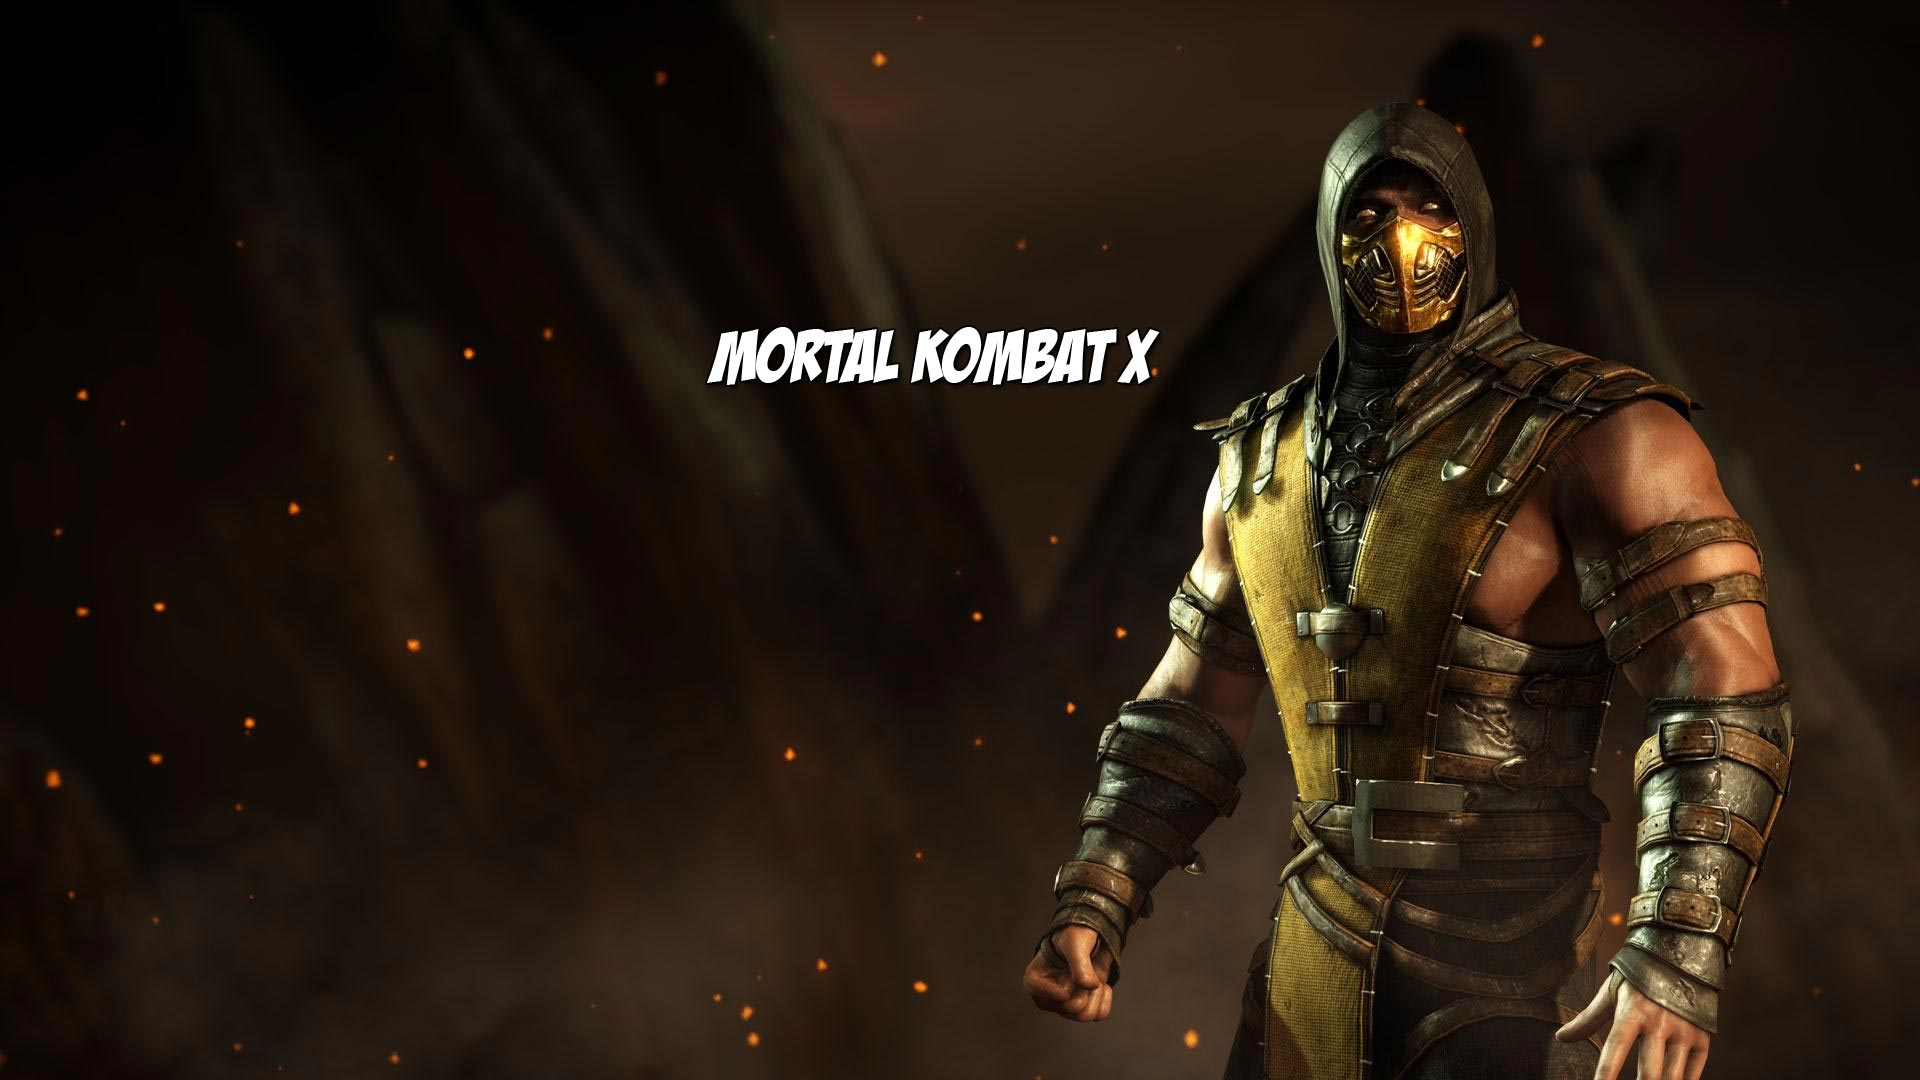 Mortal Kombat 11 Scorpion render 2 out of 2 image gallery